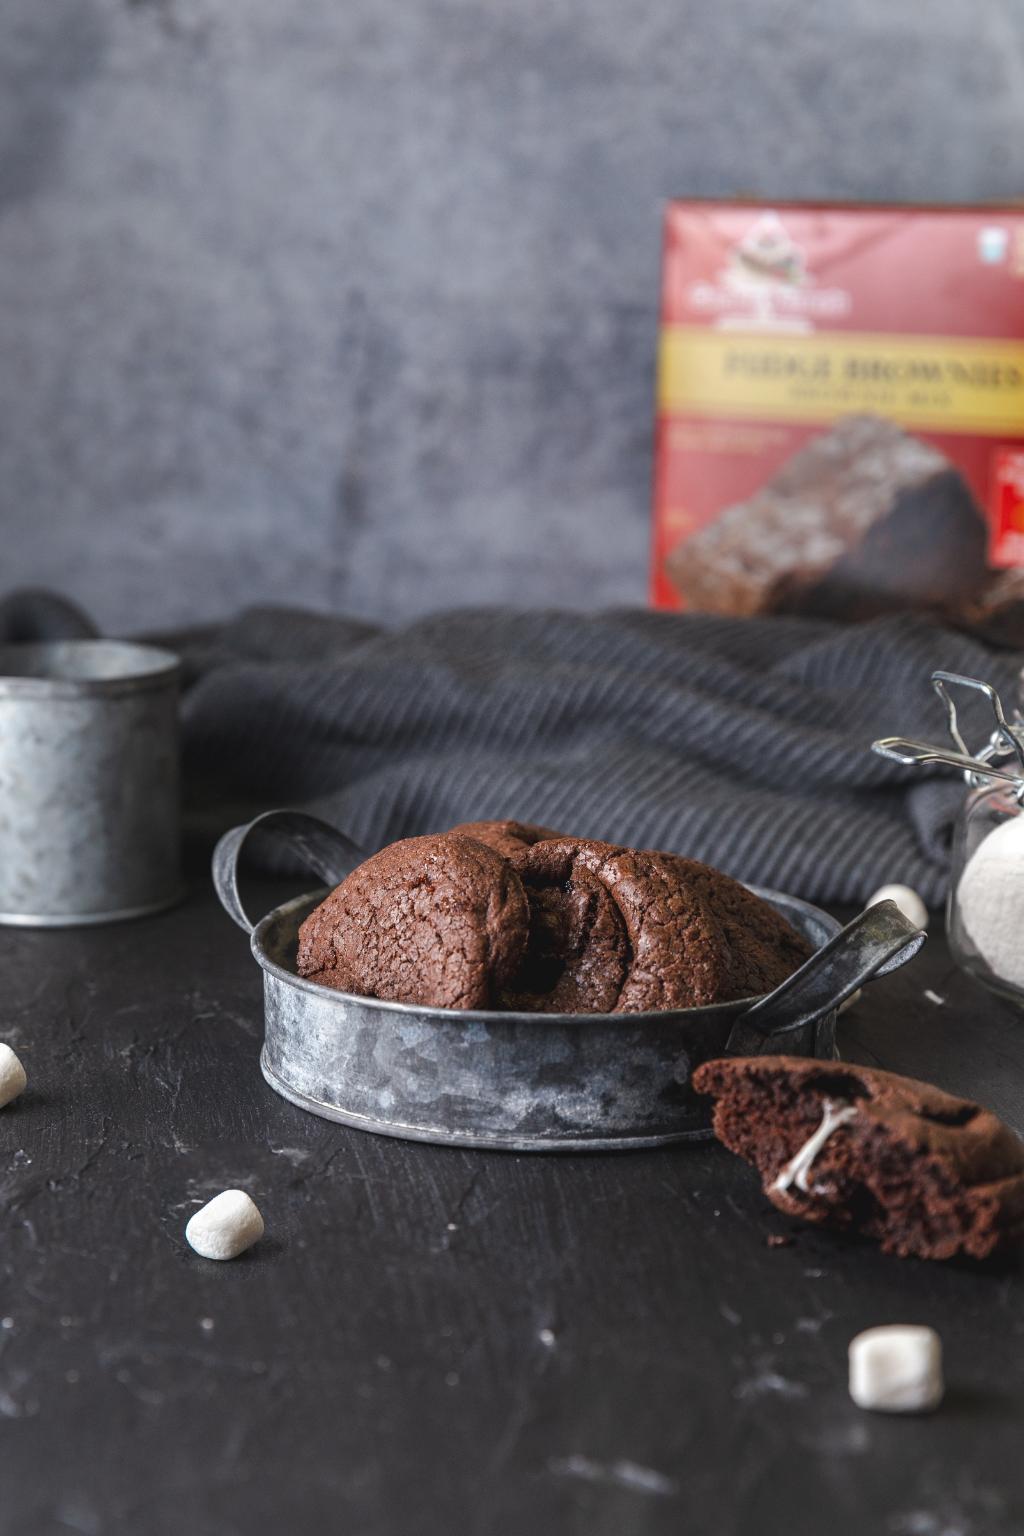 New Recipe: Marshmallow Surprise Fudge Cookies